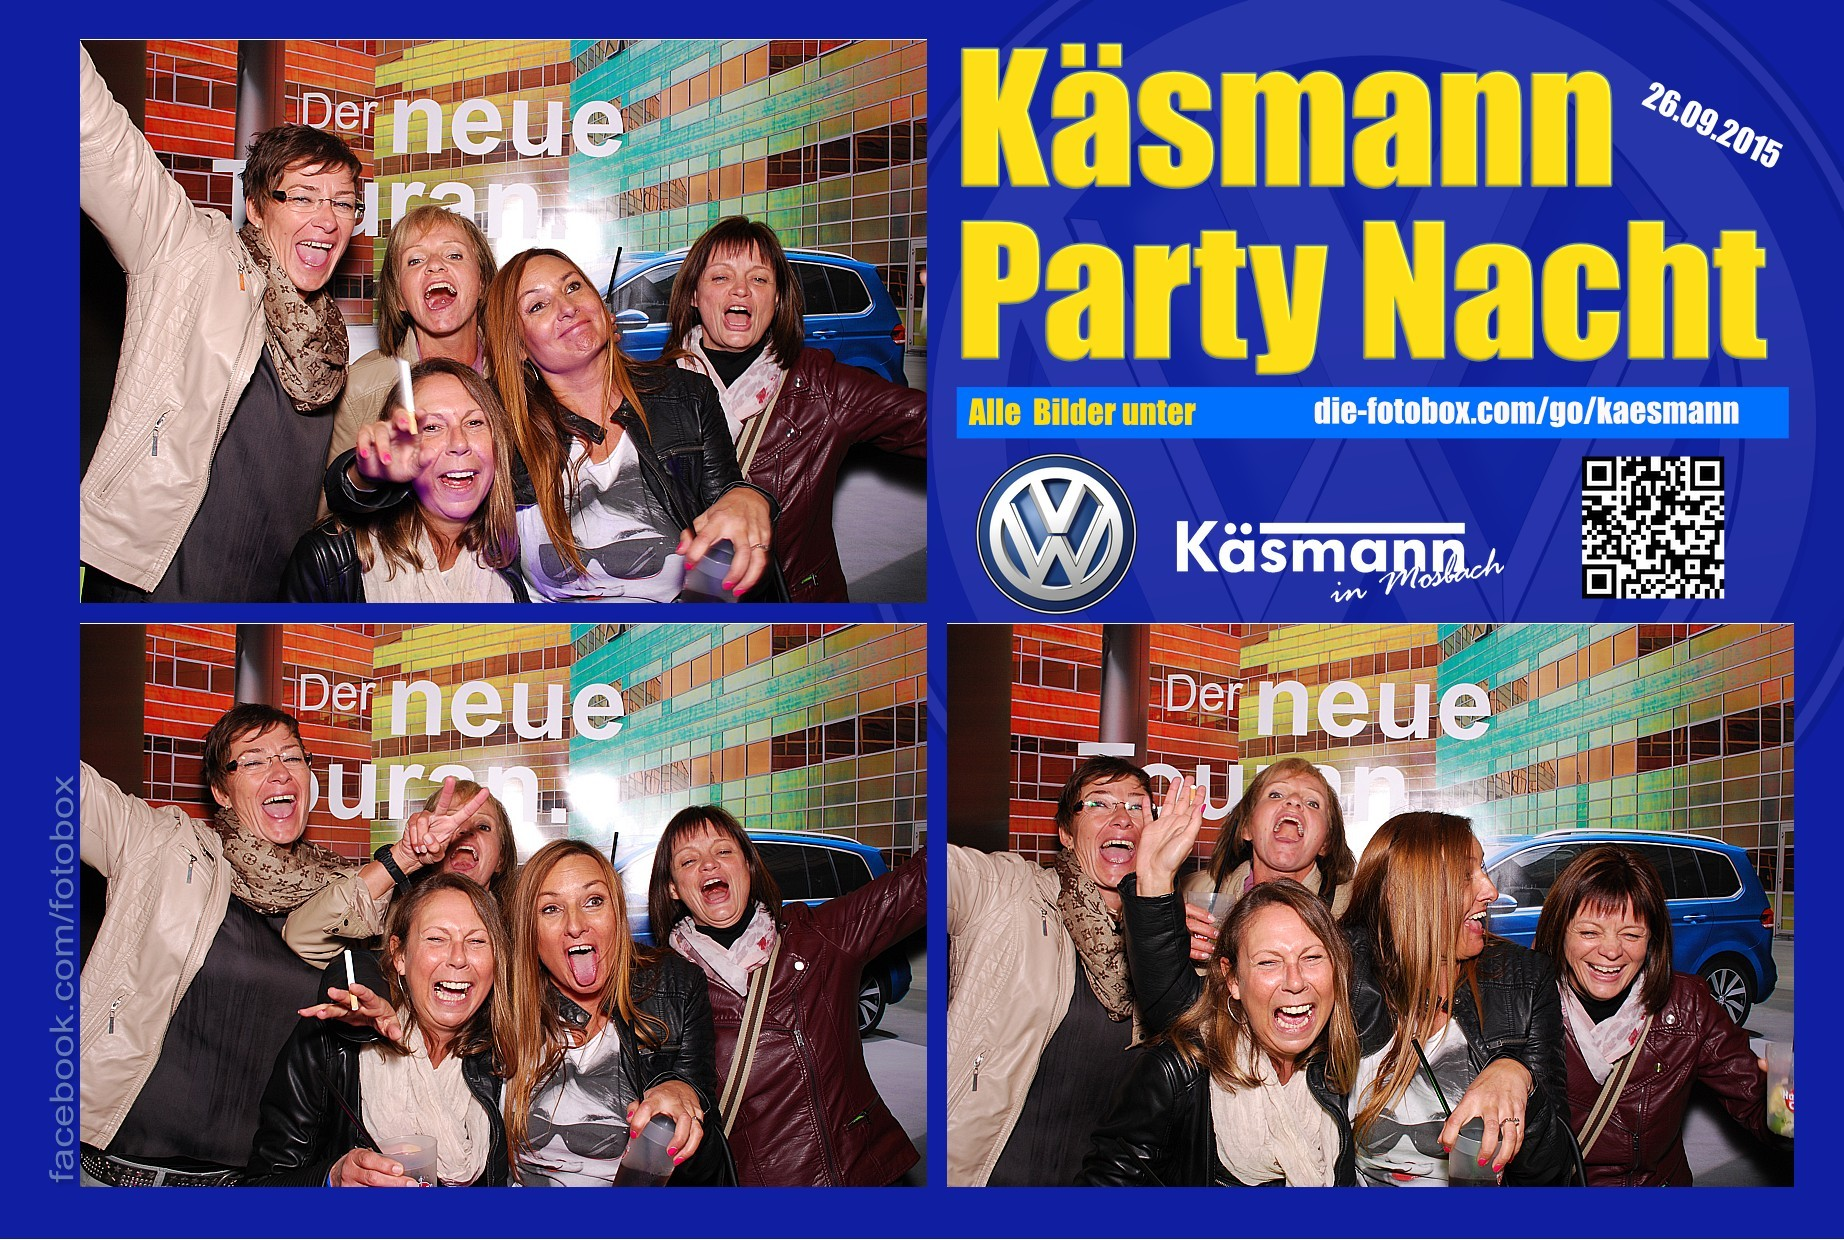 Käsmannparty 2015 - www.die-fotobox.com 01383